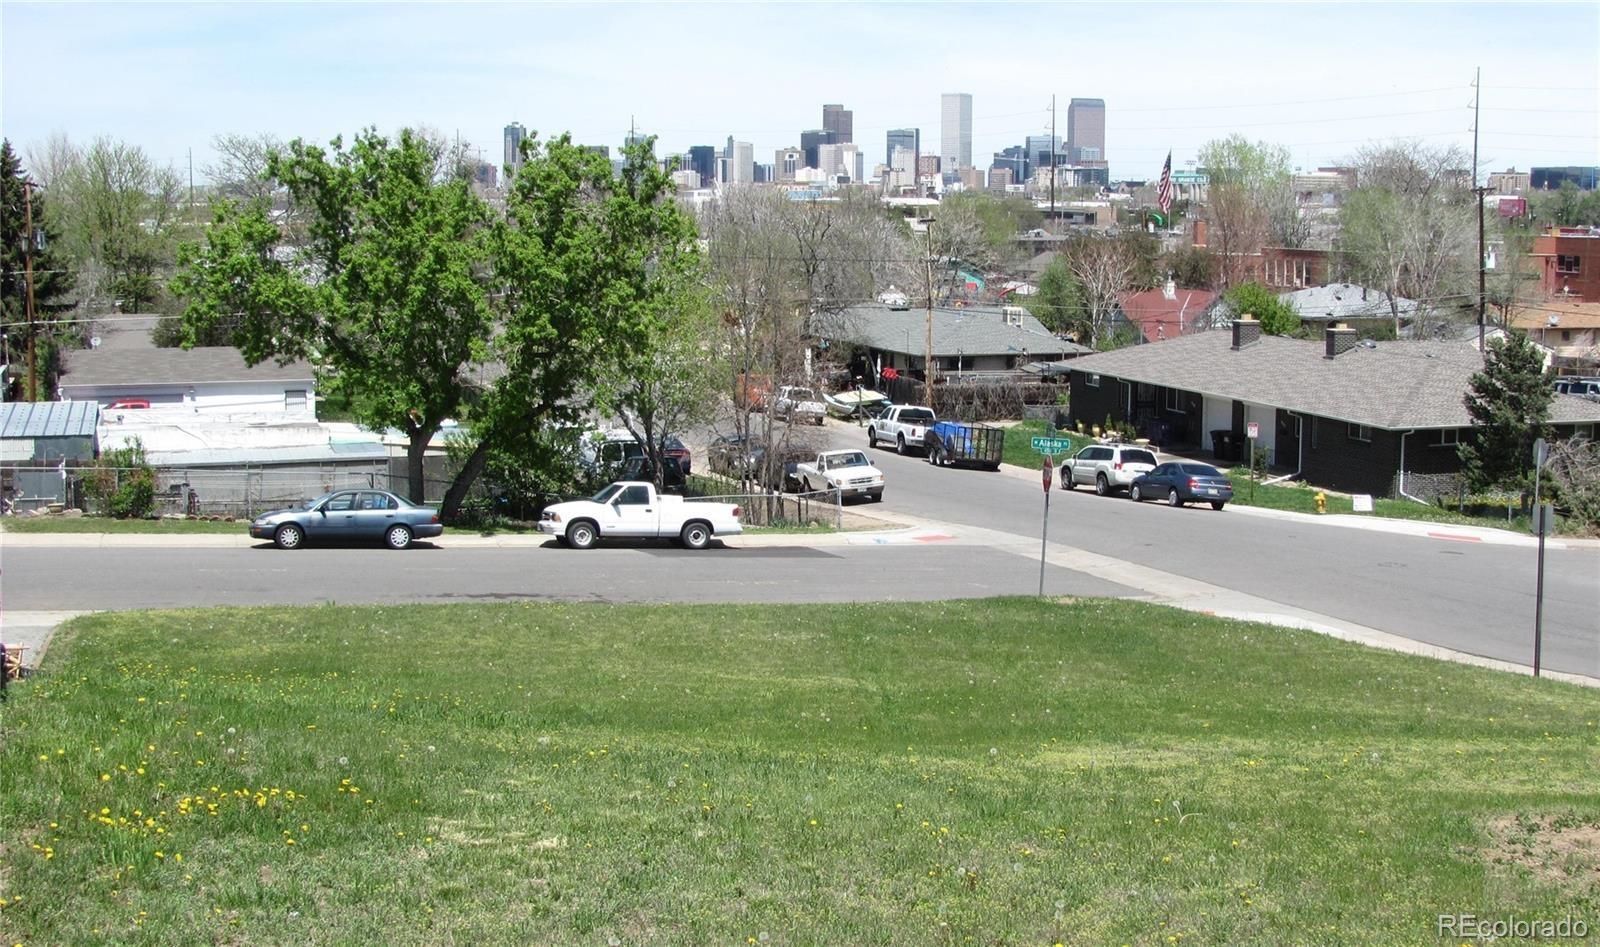 MLS# 3172453 - 2 - 1400 W Alaska Place, Denver, CO 80223